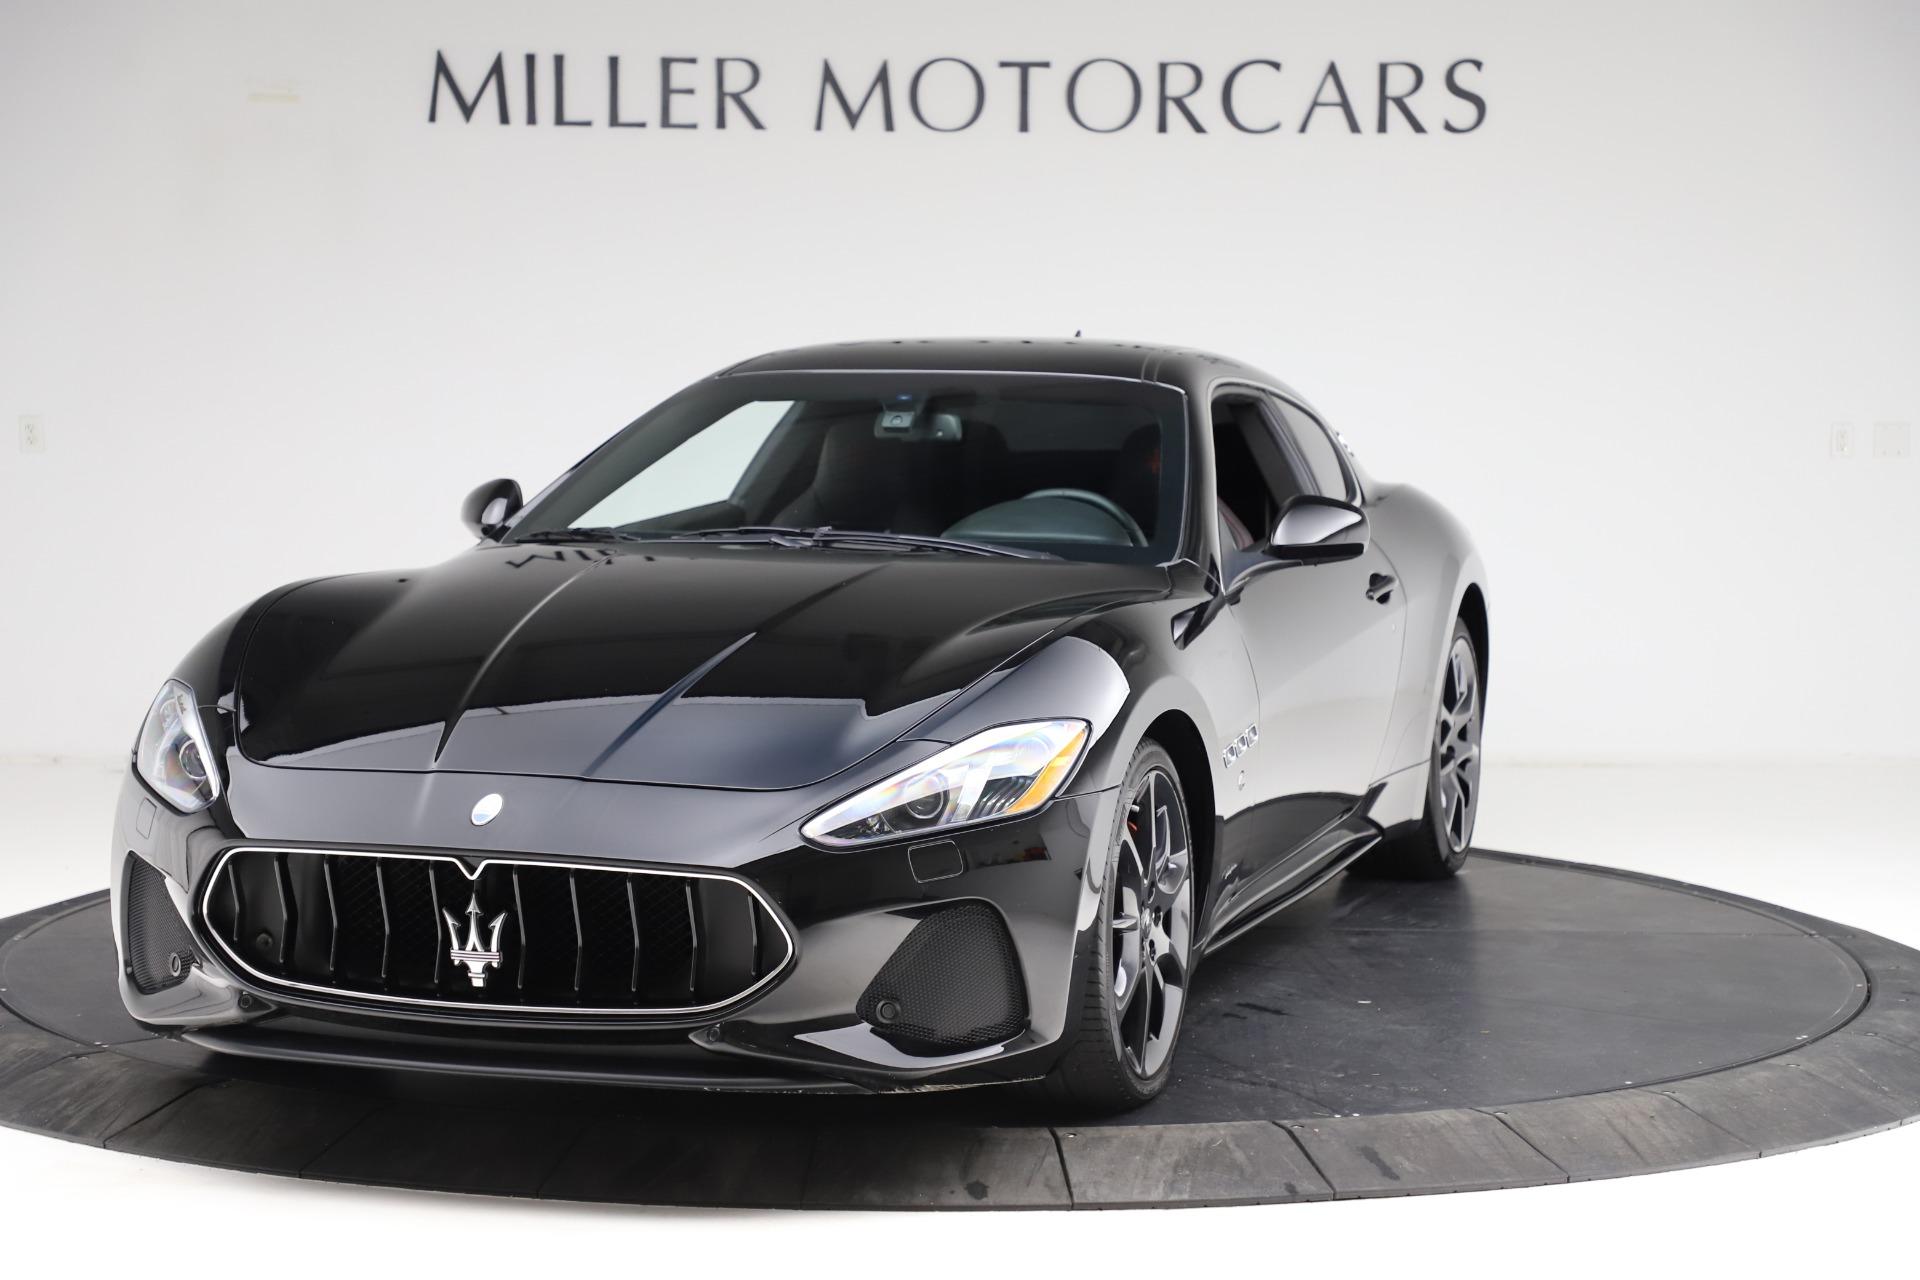 Used 2018 Maserati GranTurismo Sport for sale $89,900 at Rolls-Royce Motor Cars Greenwich in Greenwich CT 06830 1